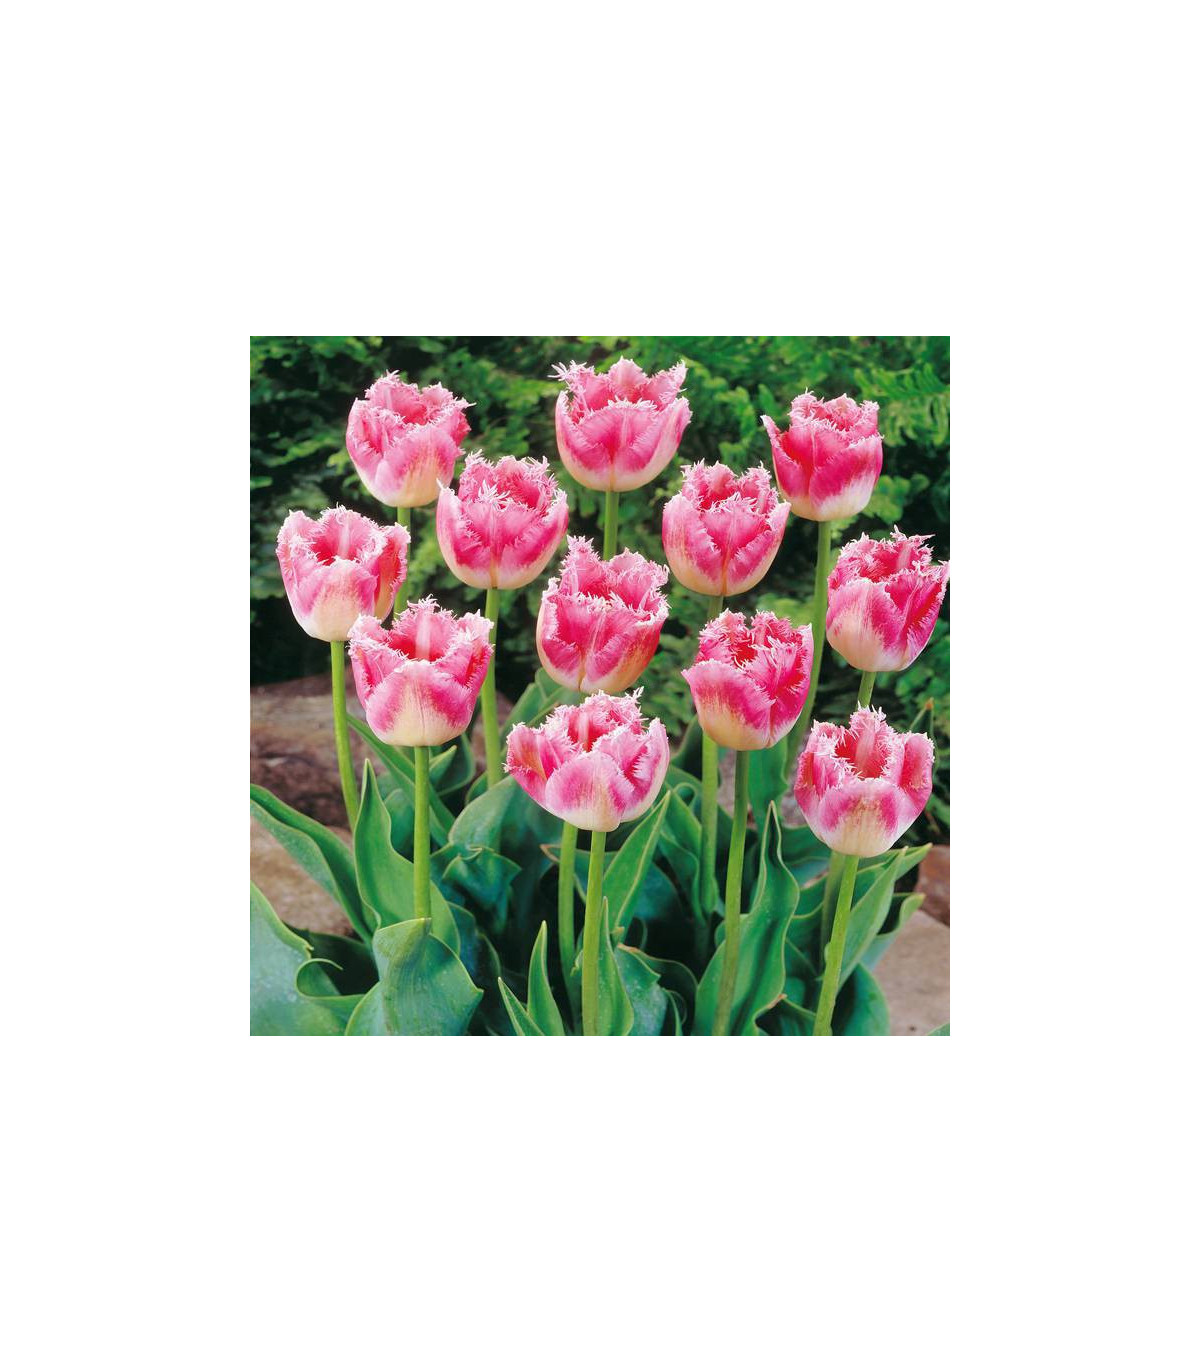 Tulipán Fancy Frills - Tulipa - predaj cibuľovín - 3 ks